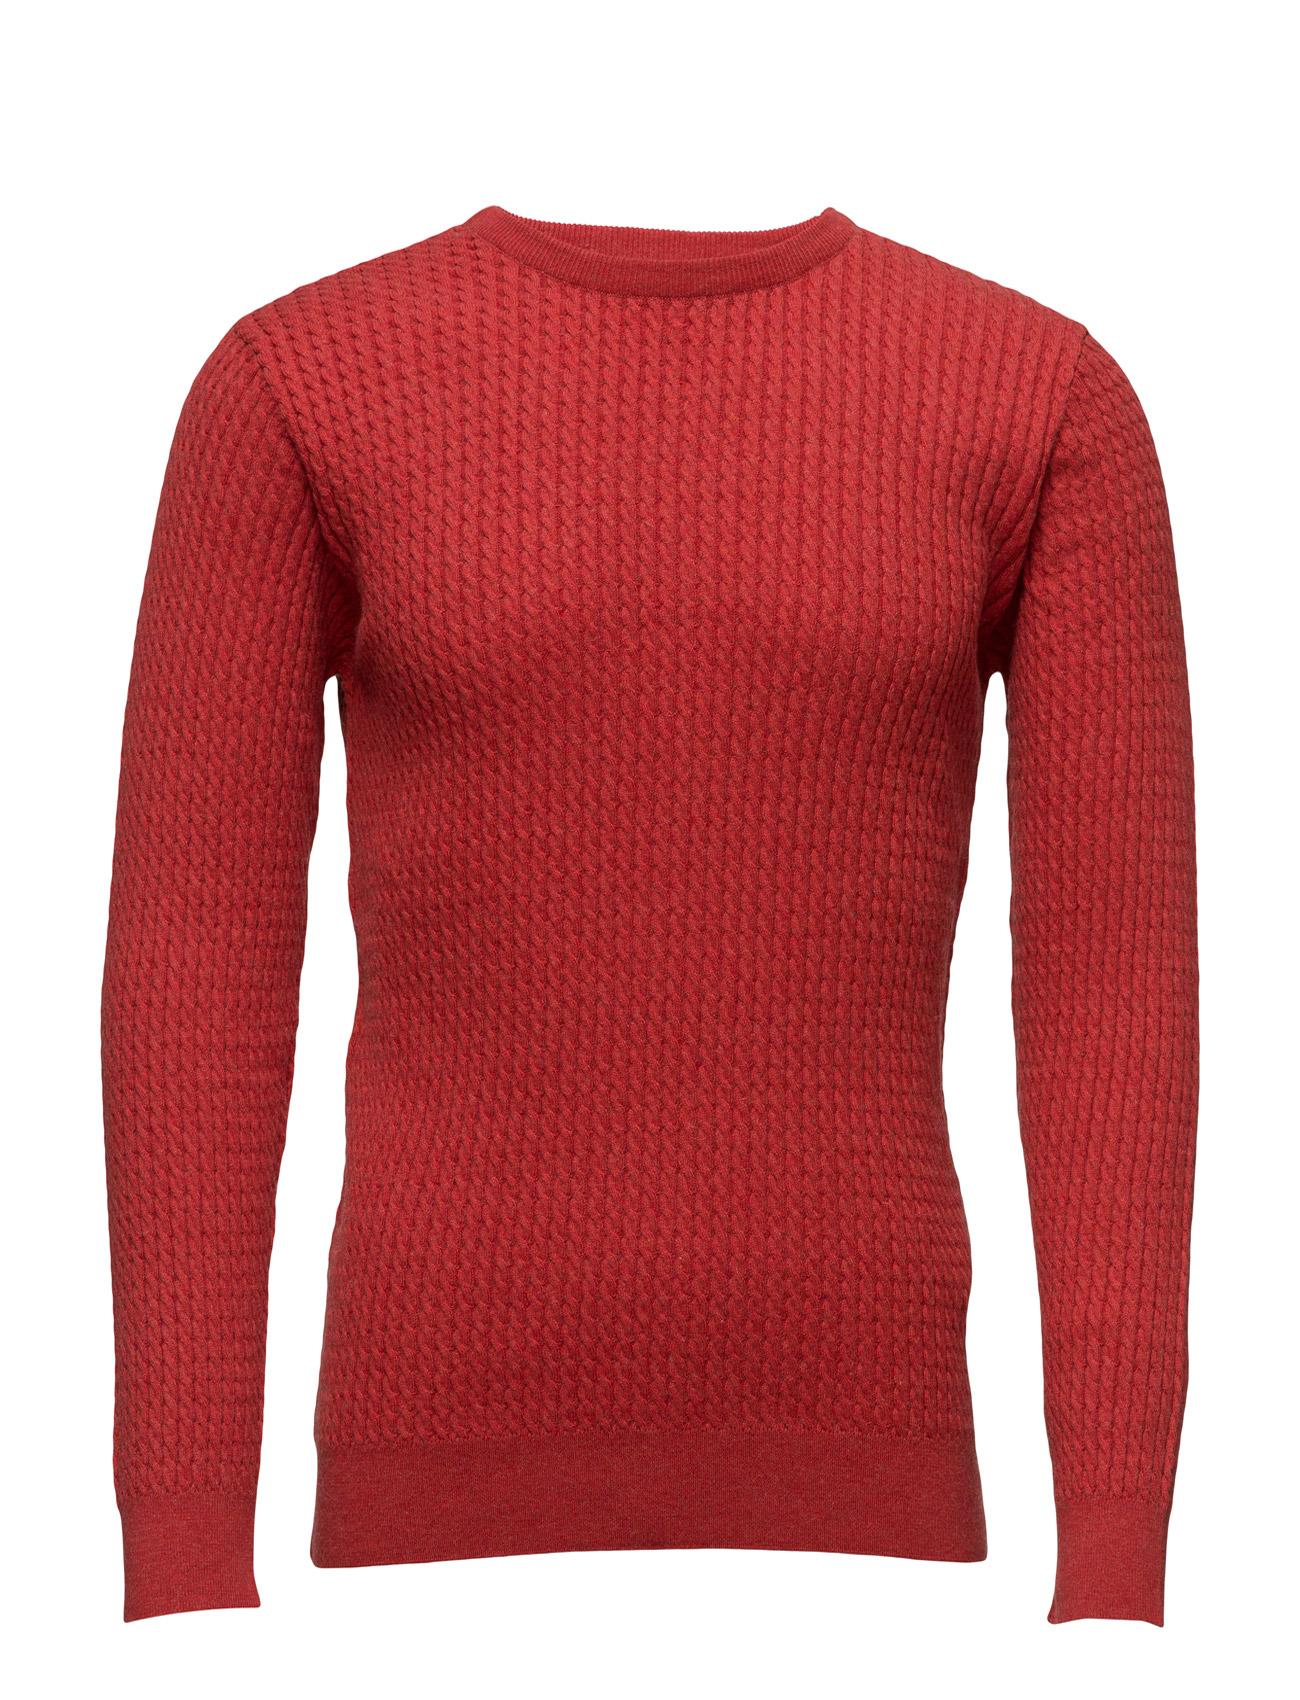 Cotton/Cashmere Cable Knit - Gots Knowledge Cotton Apparel Rundhalsede til Herrer i